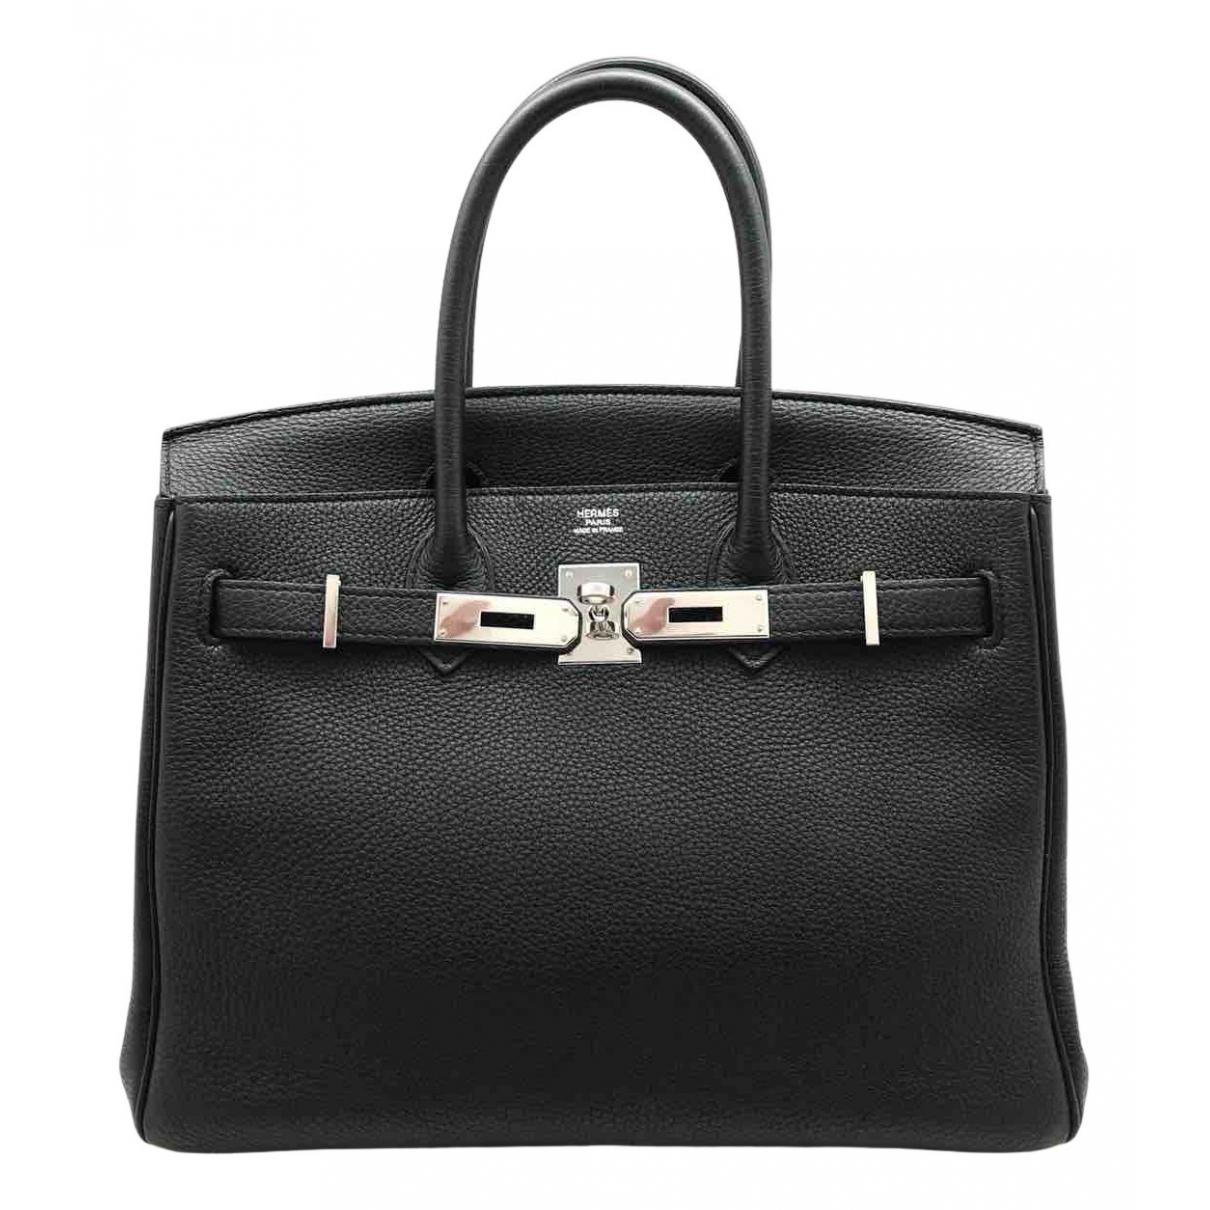 Hermes Birkin 30 Handtasche in  Schwarz Leder